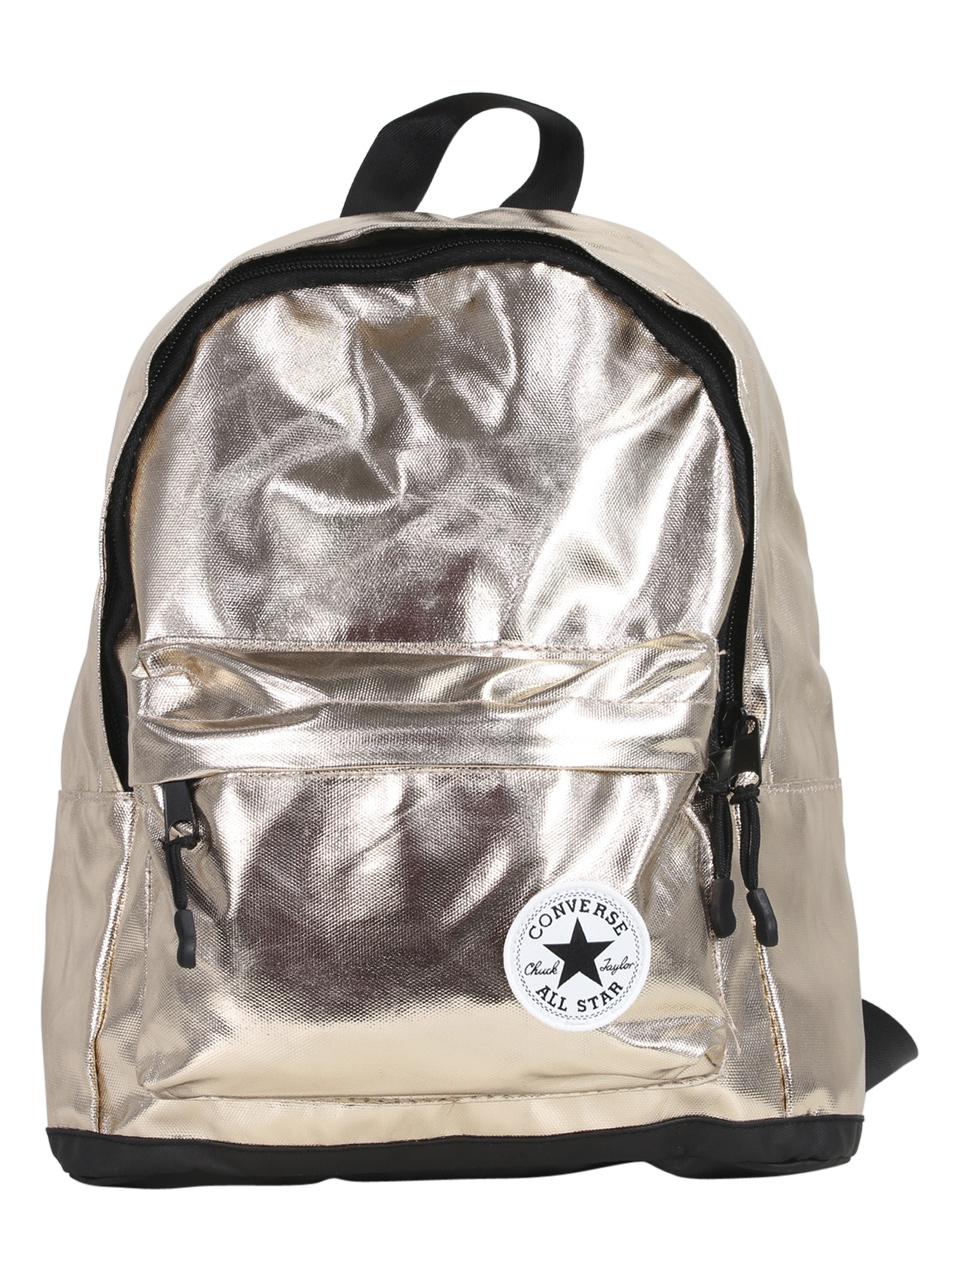 b3e872174713 Converse Kid s Daypack Small Metallic Backpack